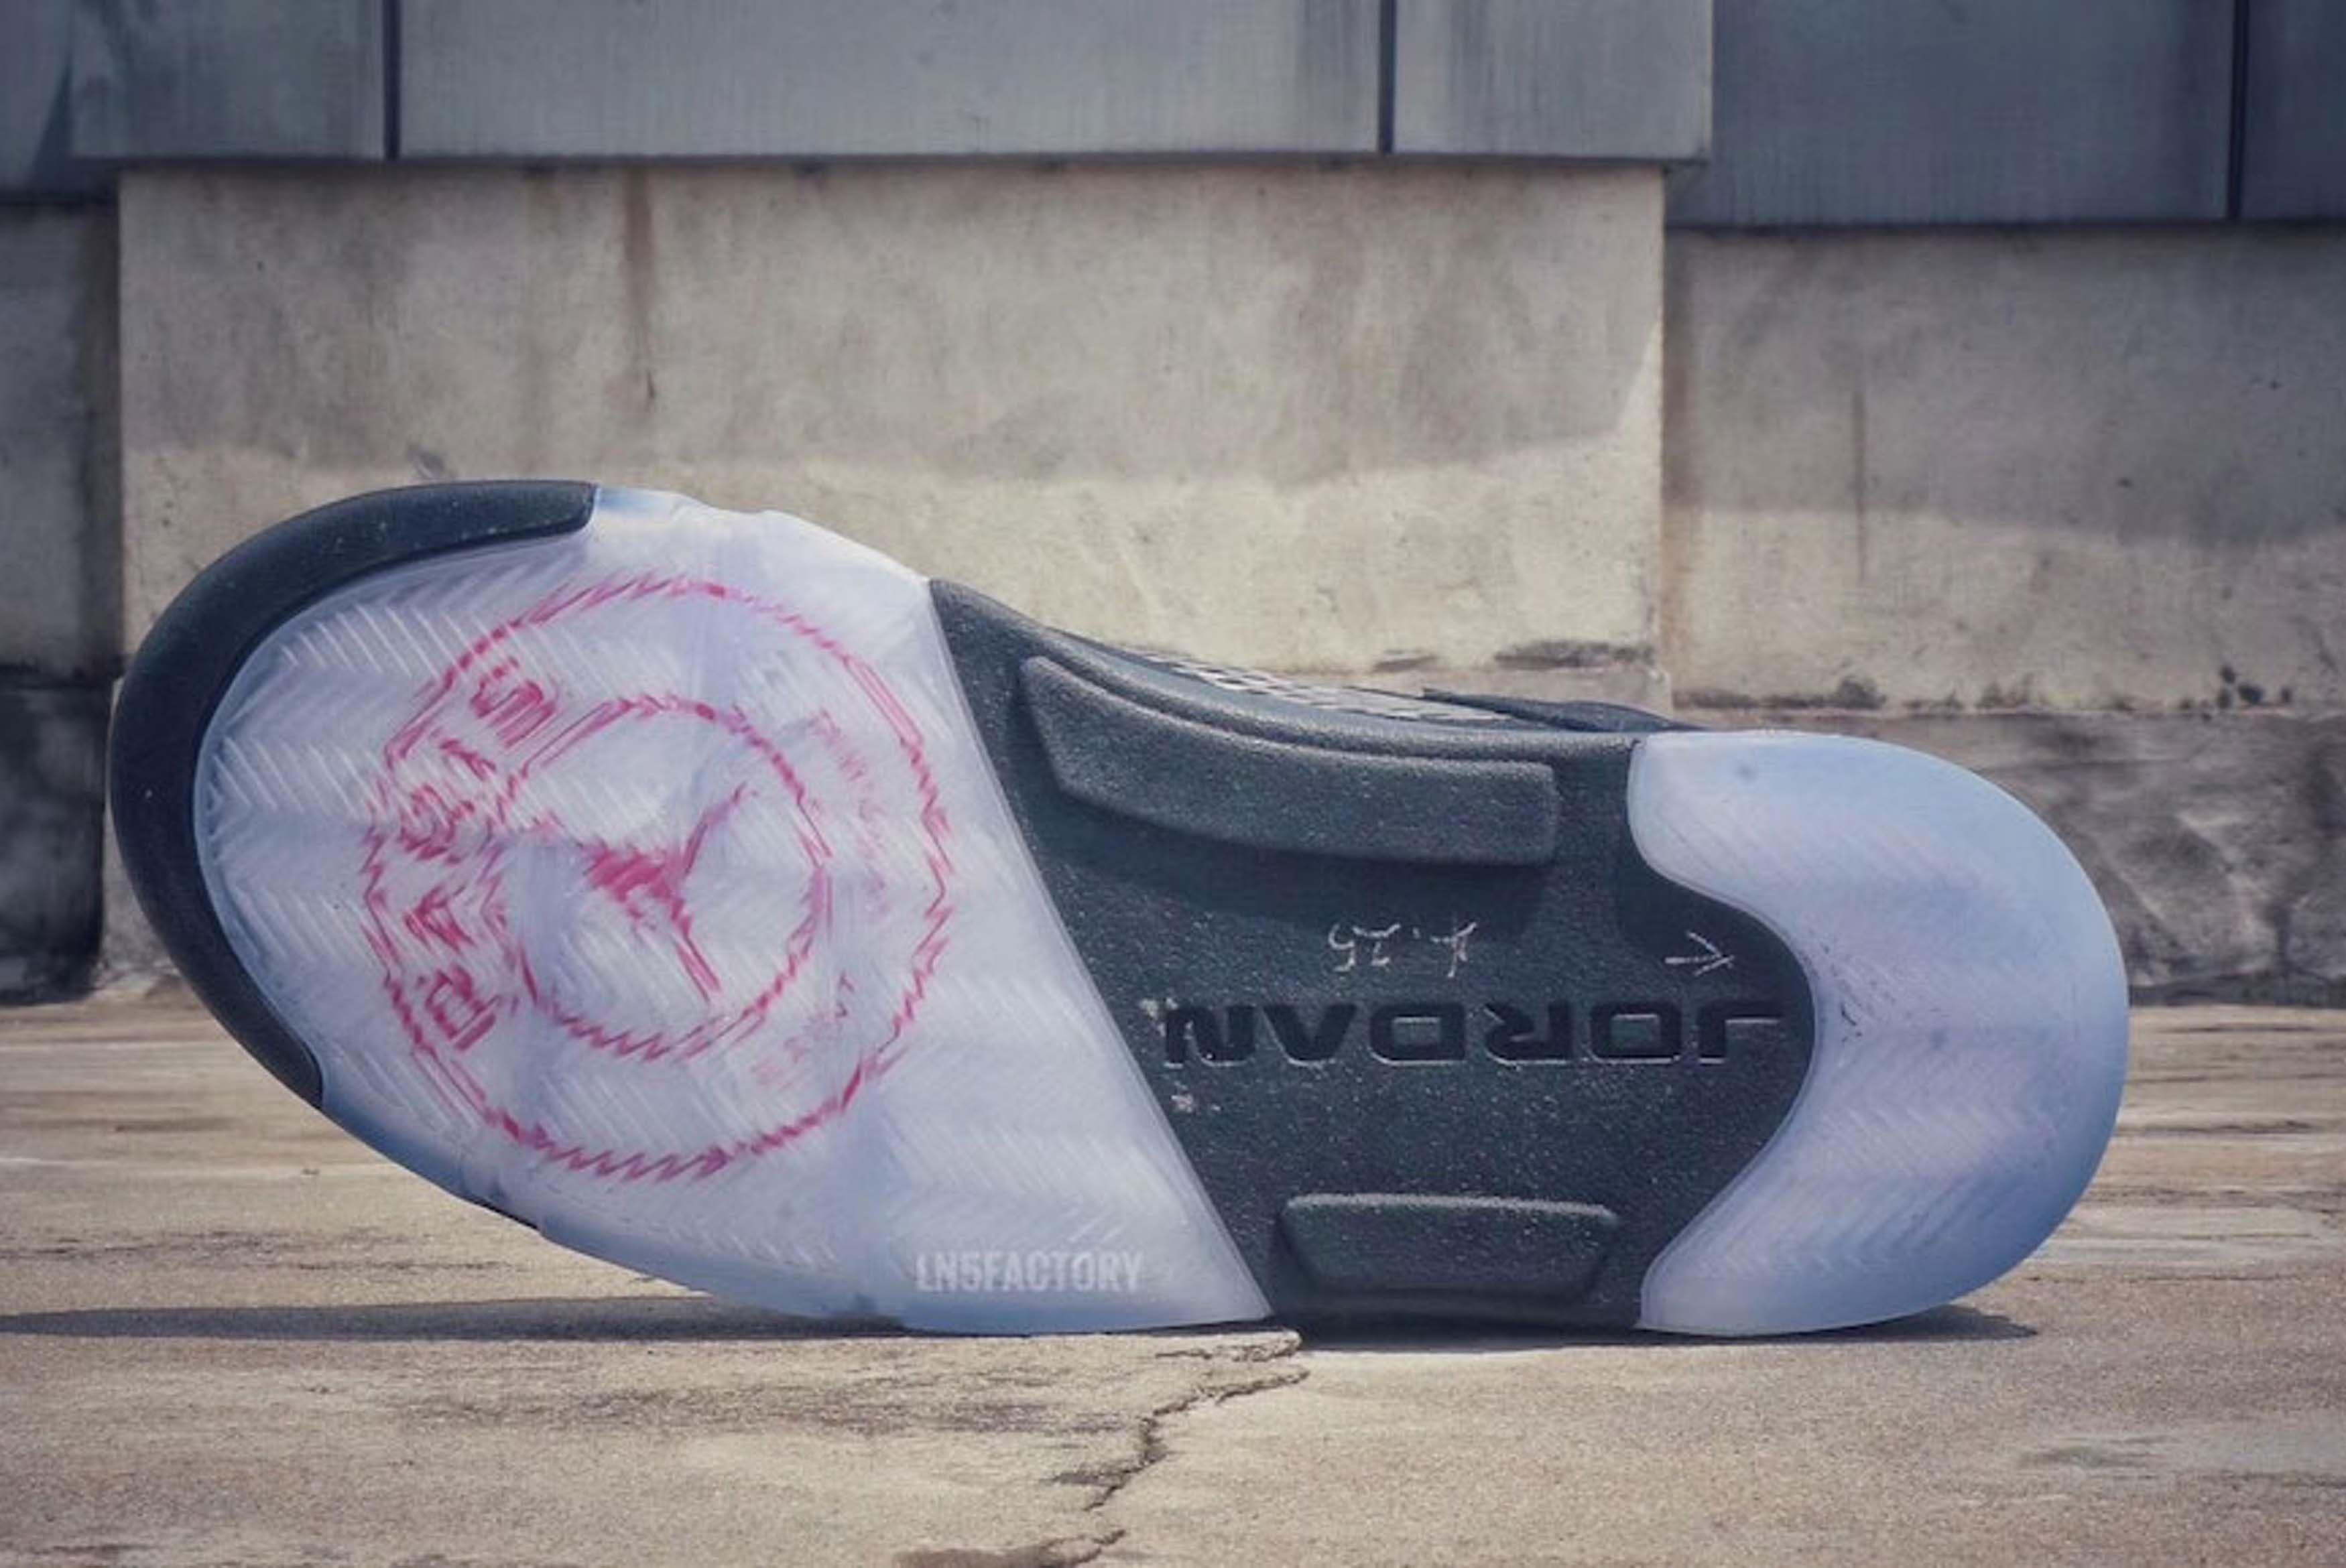 Air Jordan 5 Retro Paris Saint Germain First Look 6 Sneaker Freaker